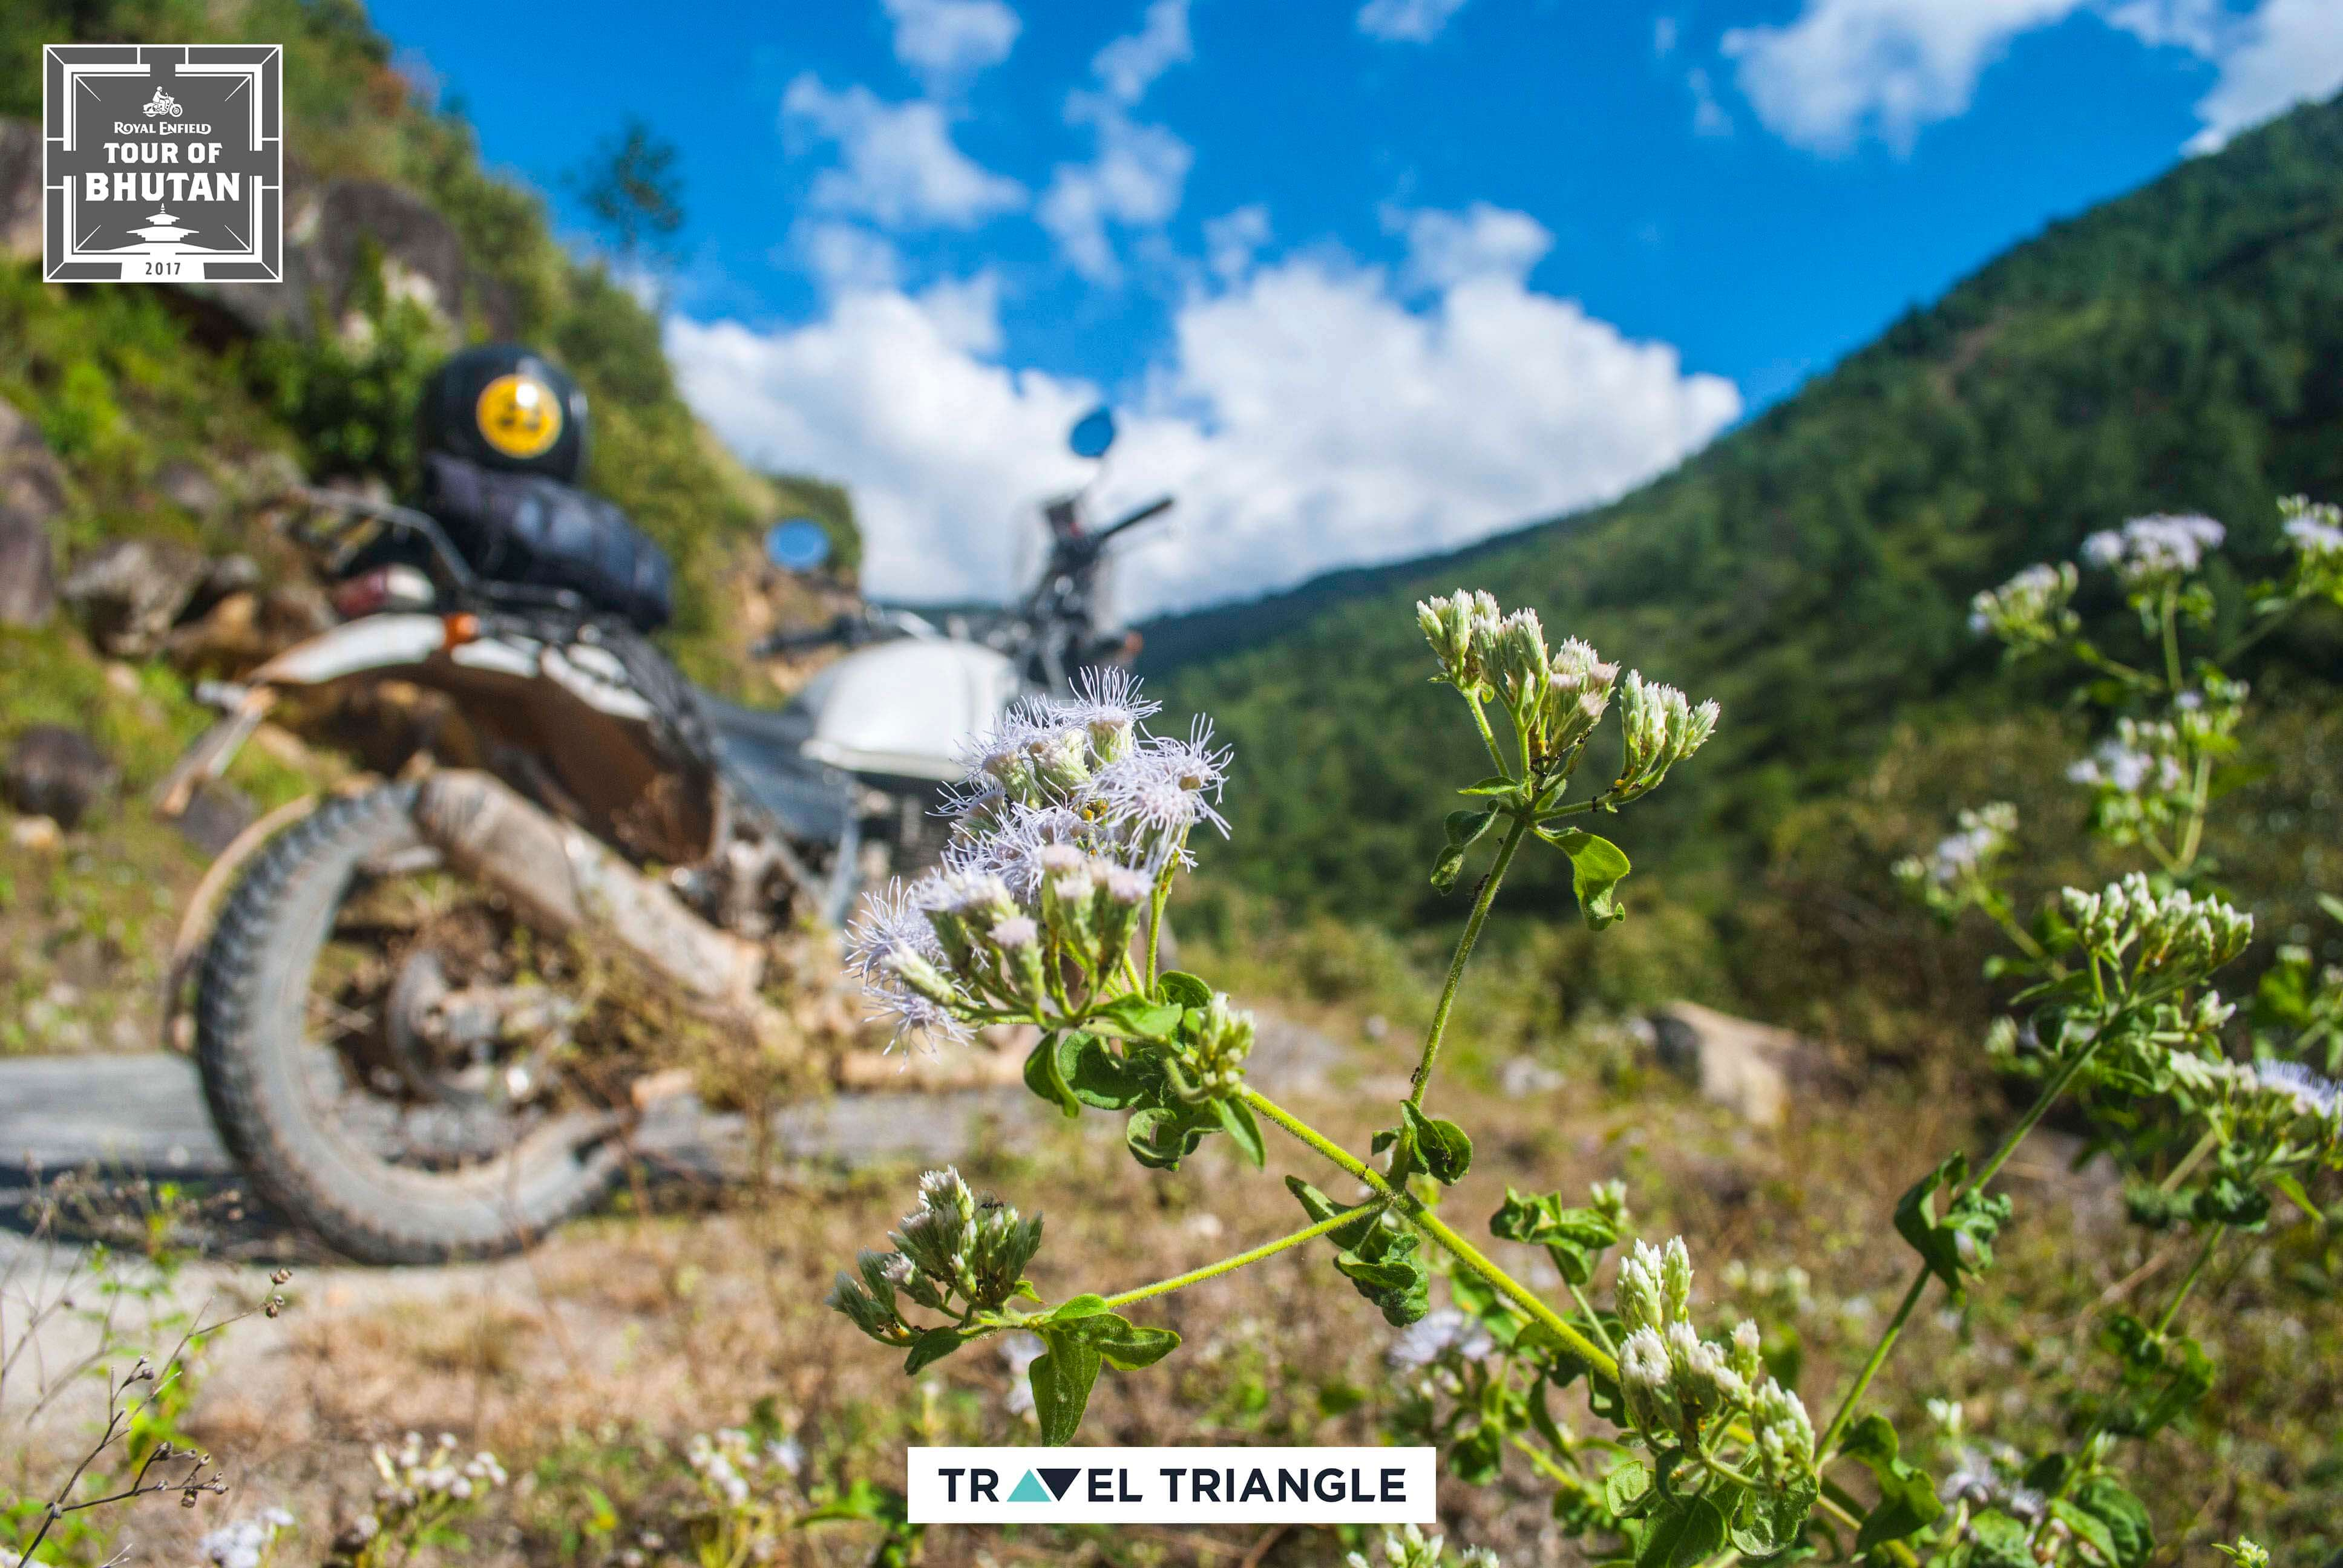 royal enfield india bhutan road trip: a bike amid flower fields